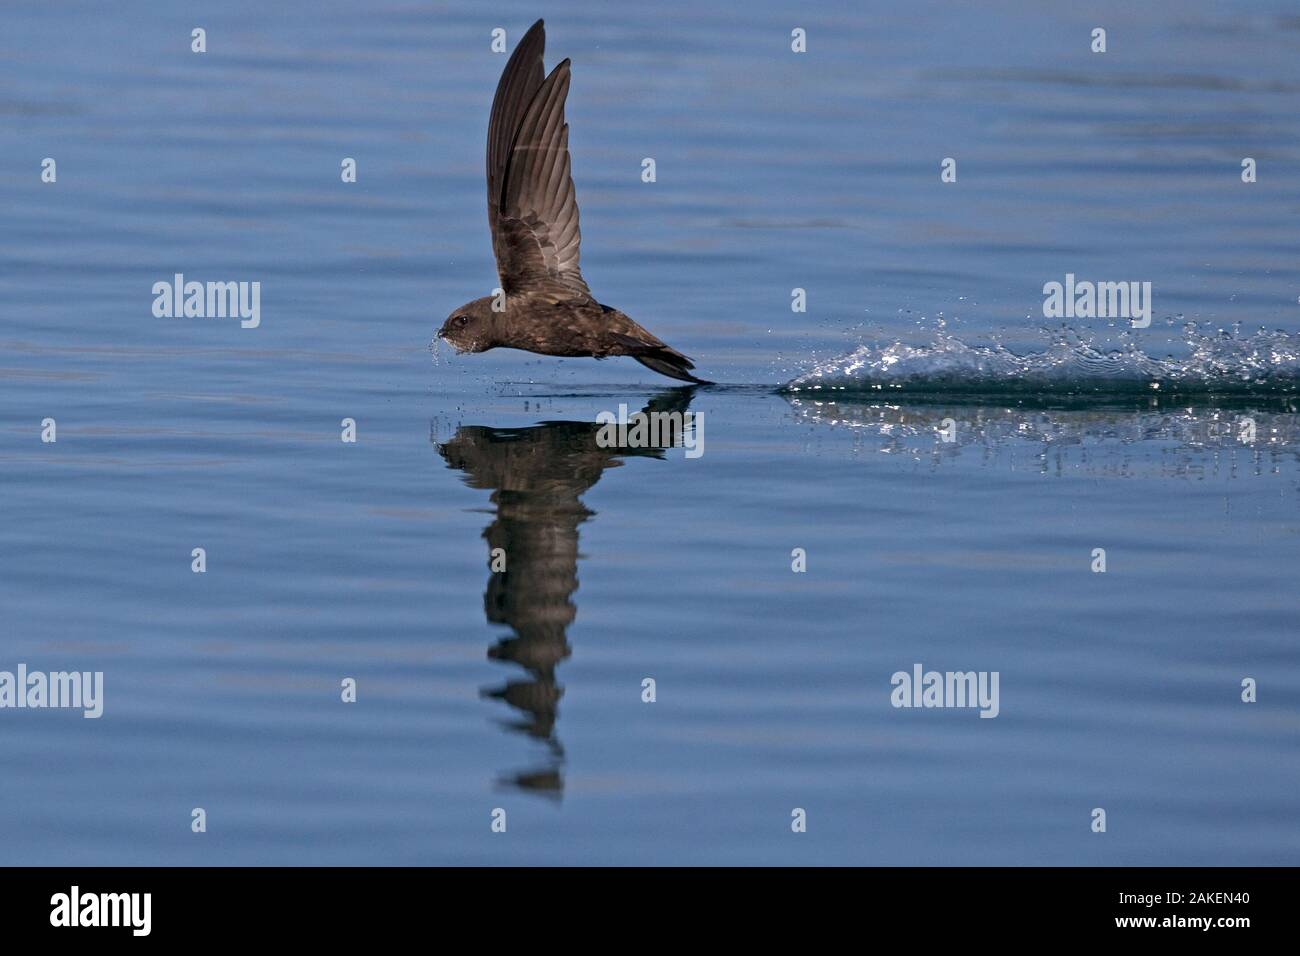 Common Swift (Apus apus) in flight reflected in water, Norfolk, England, UK. July. Stock Photo